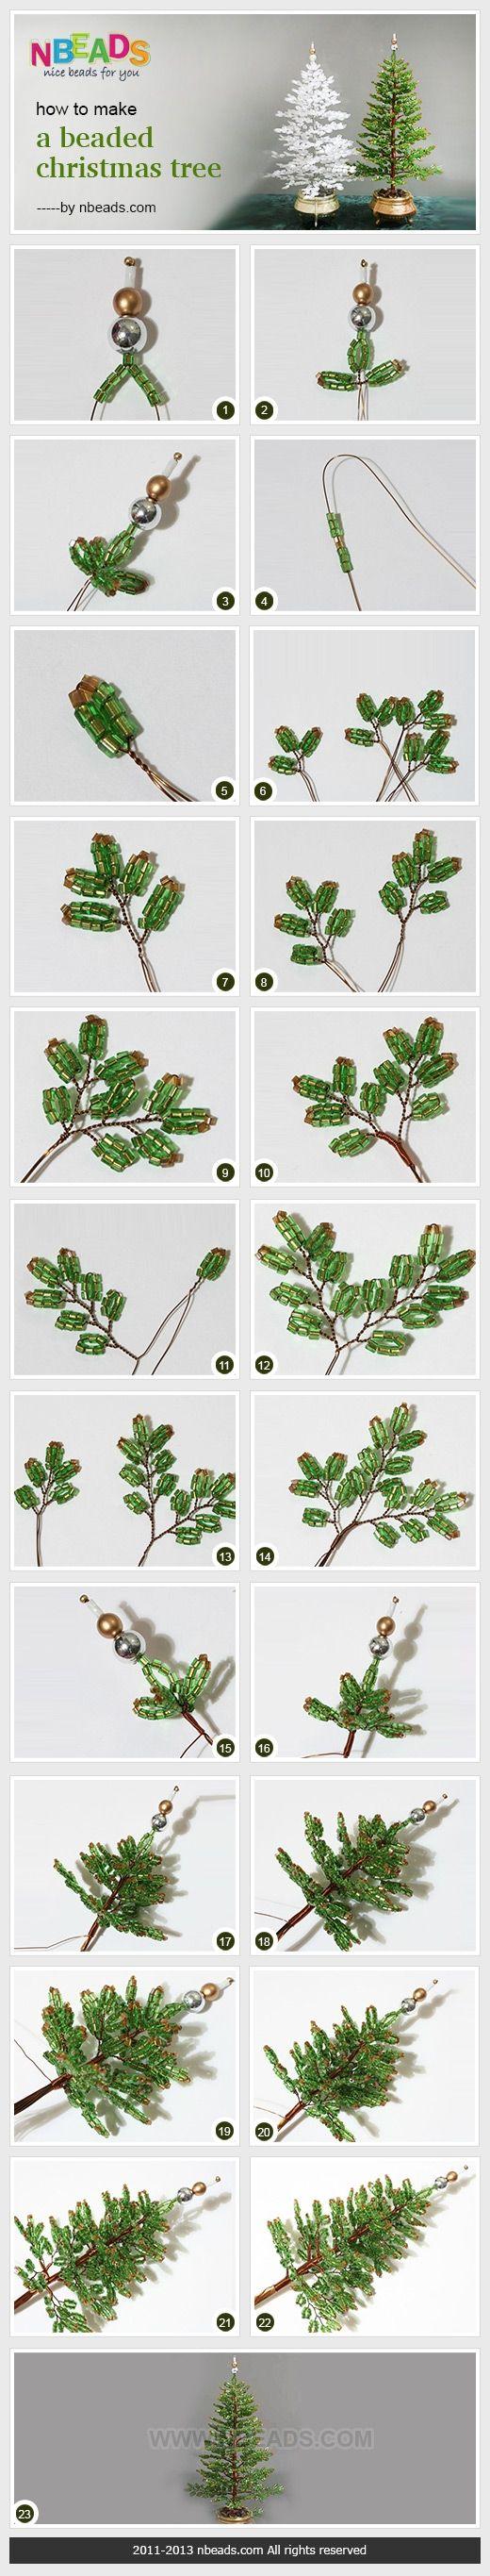 How to Make A Beaded Christmas Tree – Nbeads